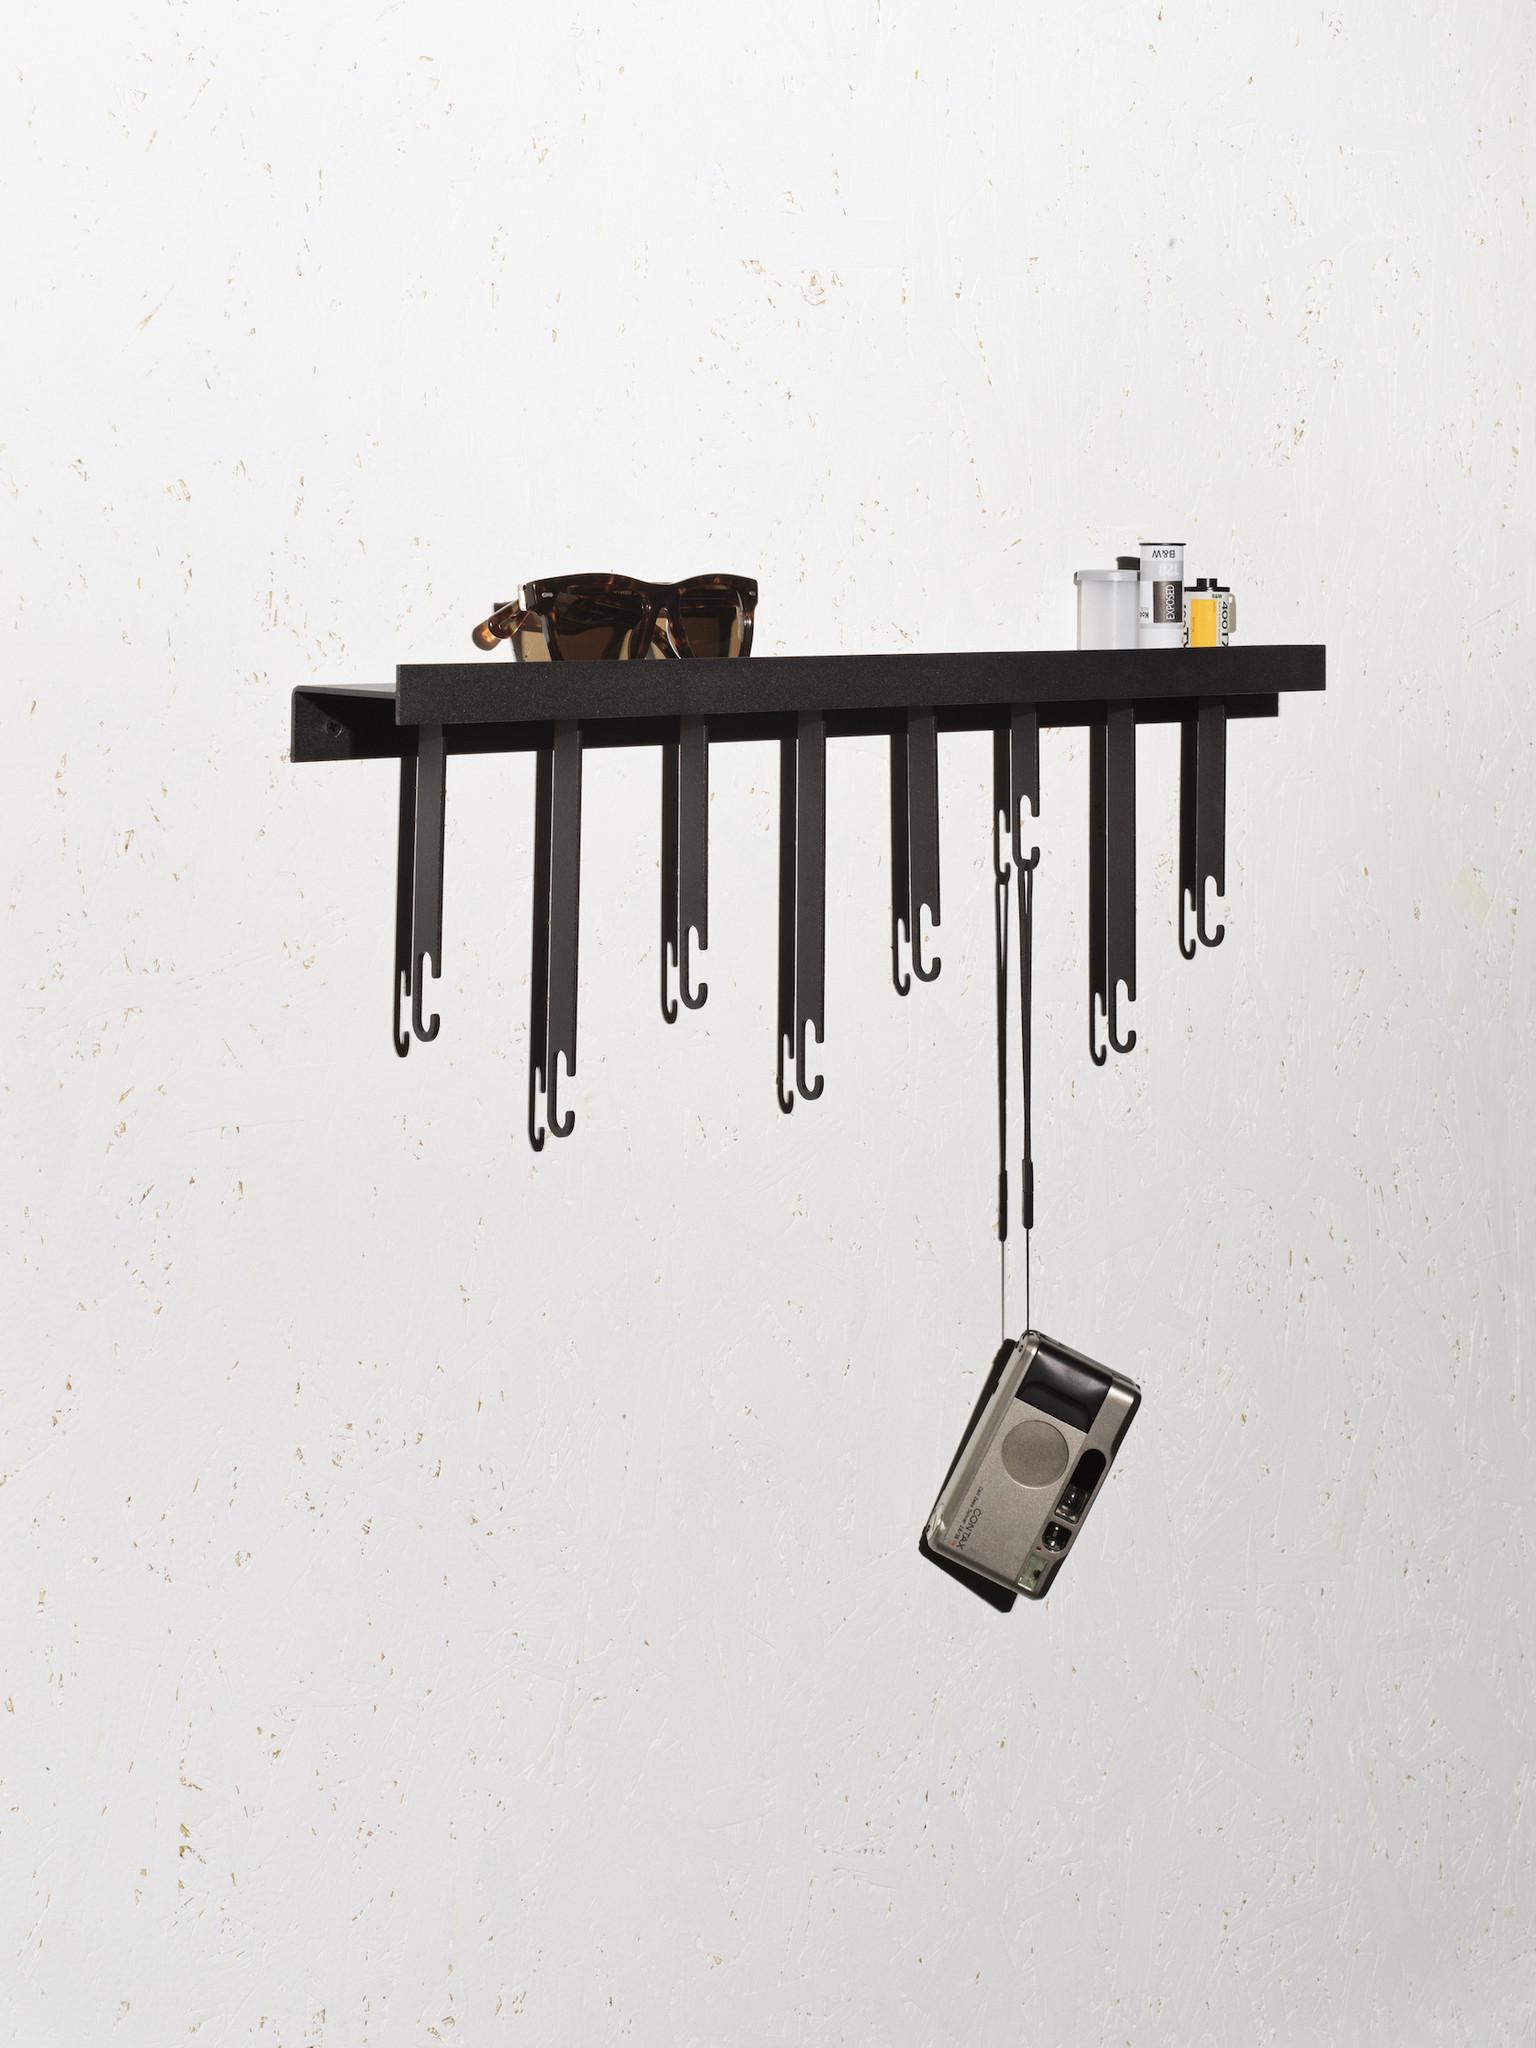 Atelier Wall Hanger-5